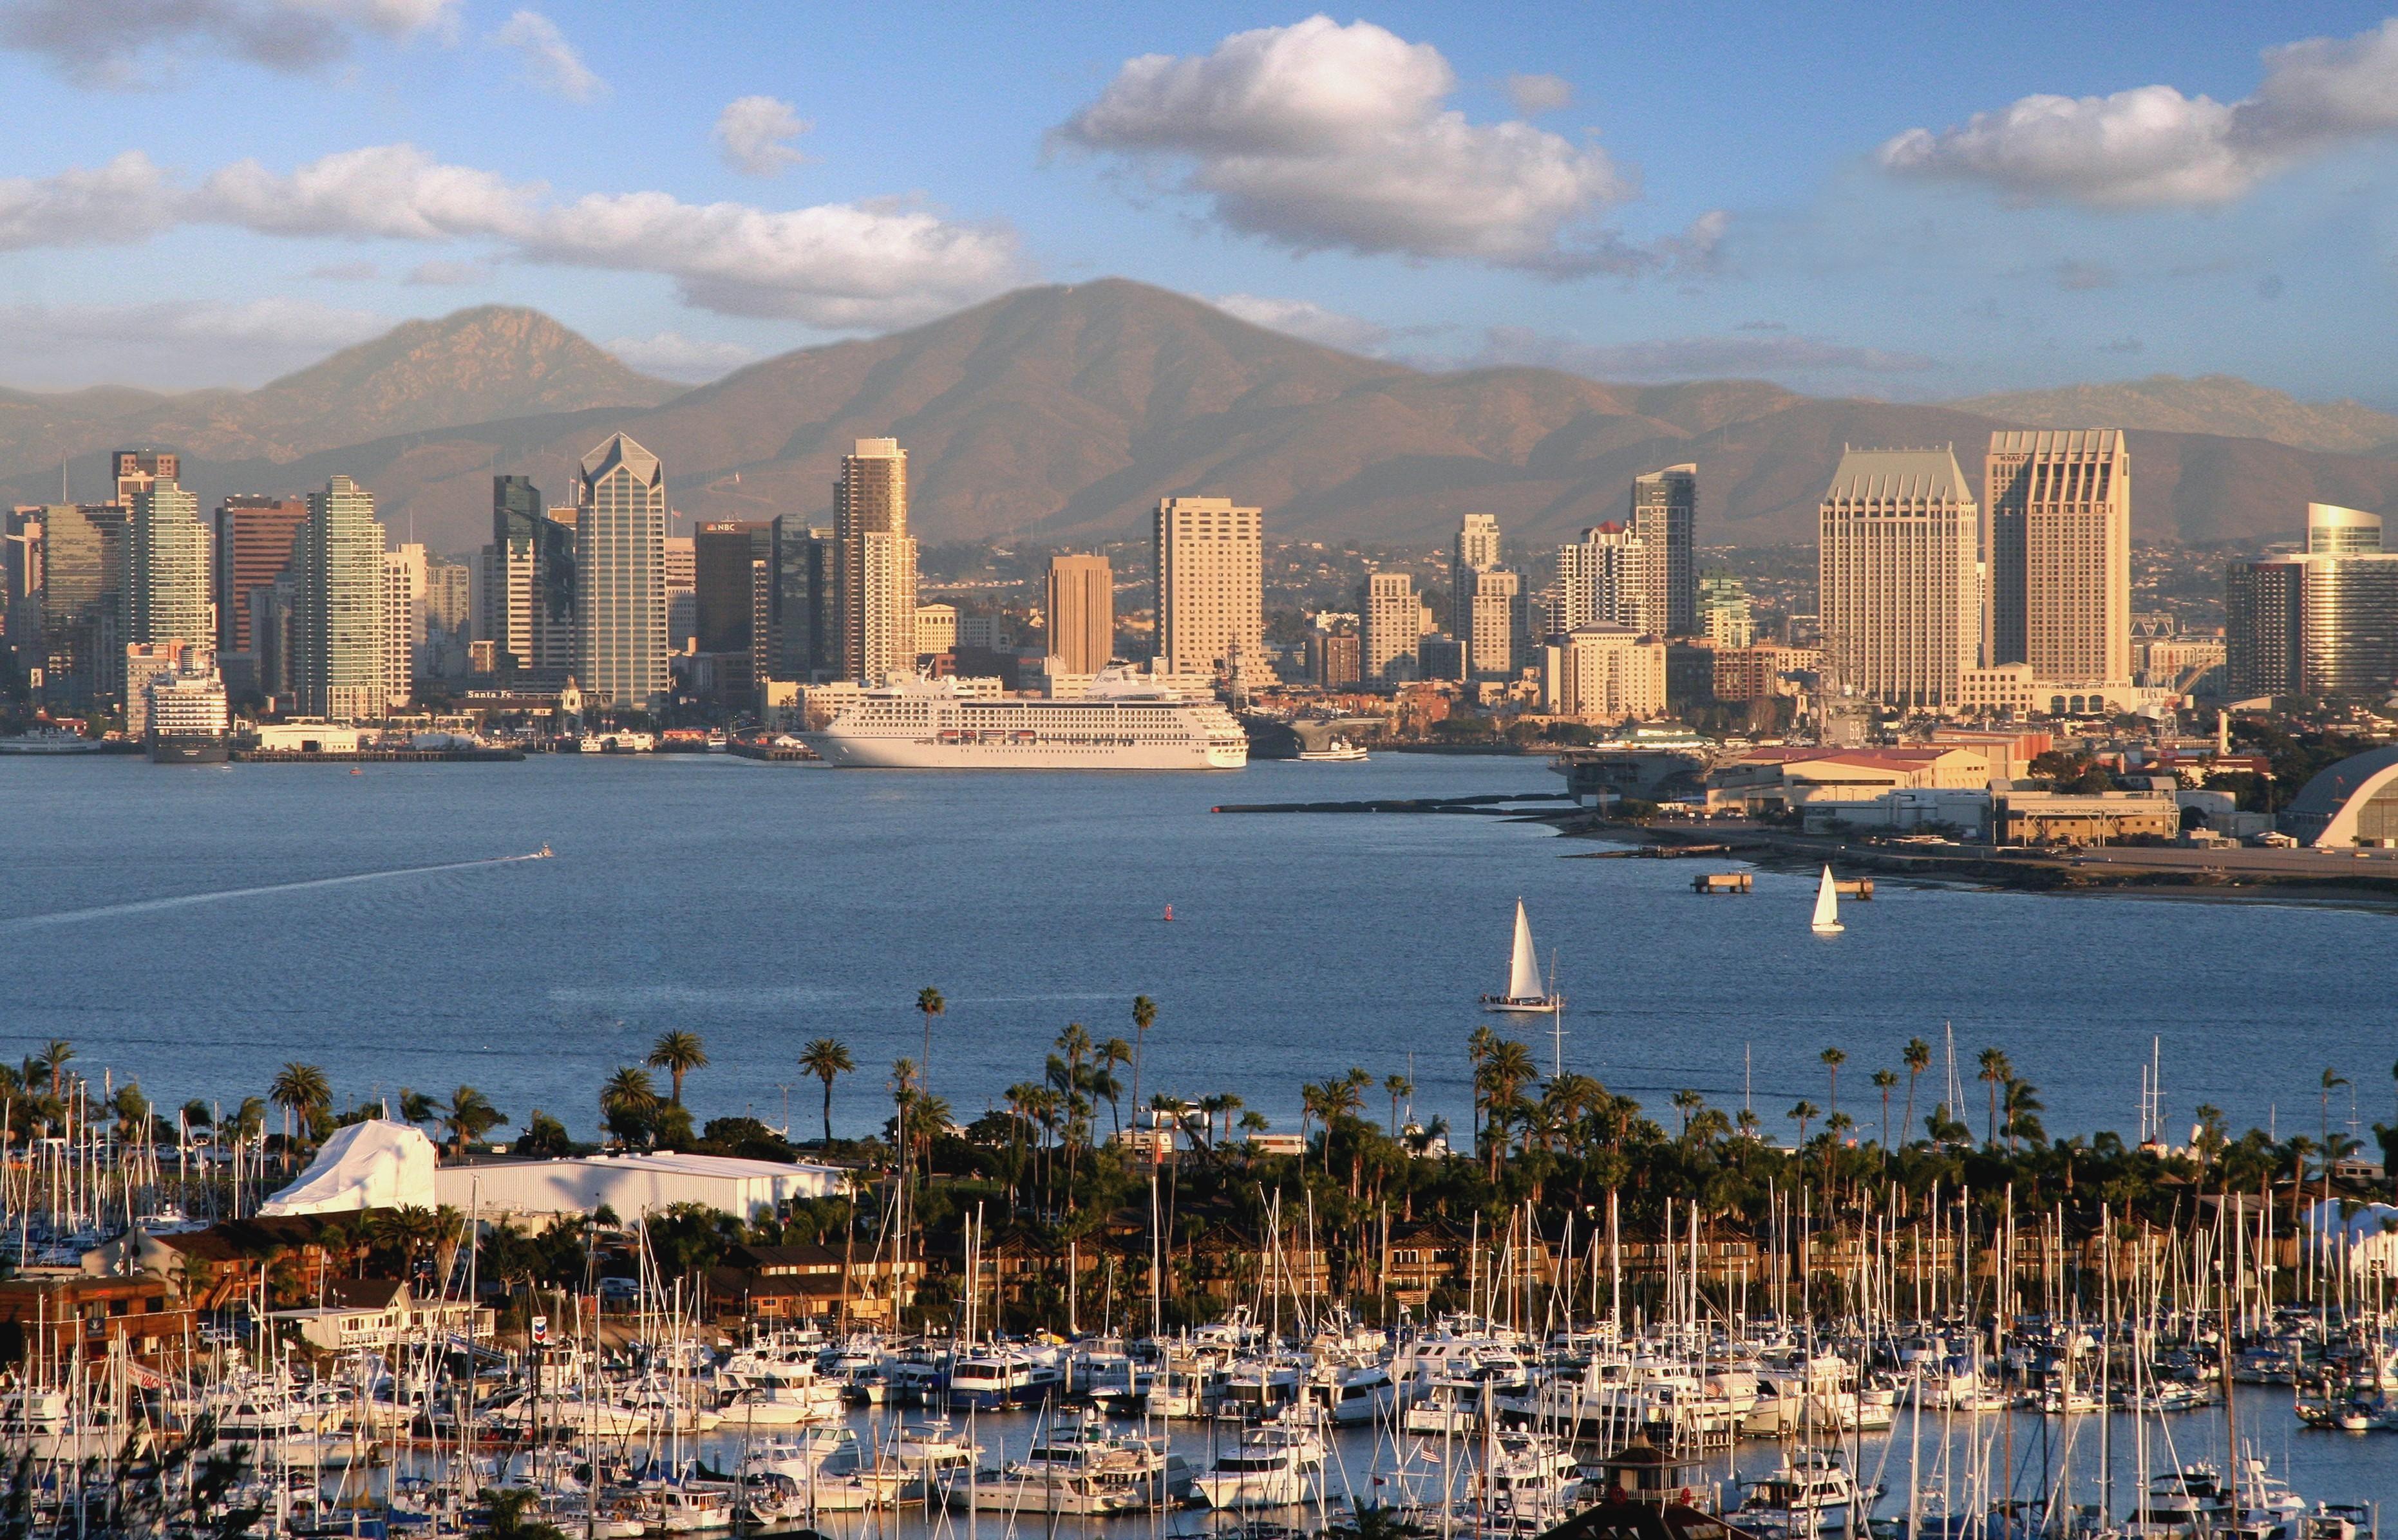 San Diego Wallpaper High Definition ~ Desktop Wallpaper Box | San diego  neighborhoods, Travel usa, Charleston attractions